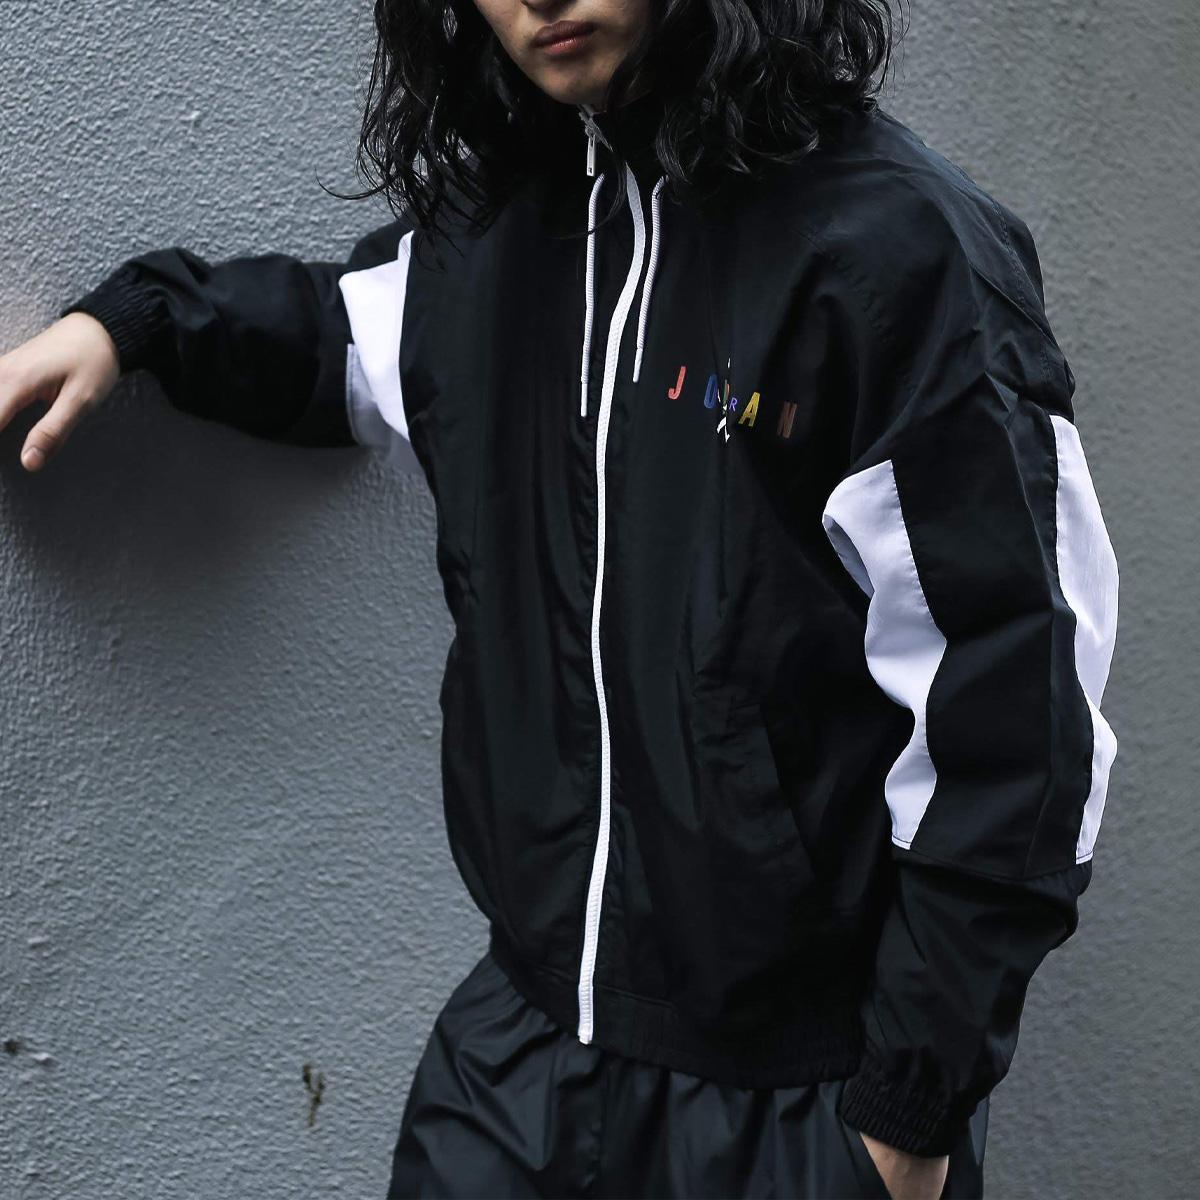 NIKE AS M J SPRTDNA HBR JKT(ナイキ ジョーダン SPRTDNA HBR ジャケット)BLACK/WHITE【メンズ ジャケット】20SP-S